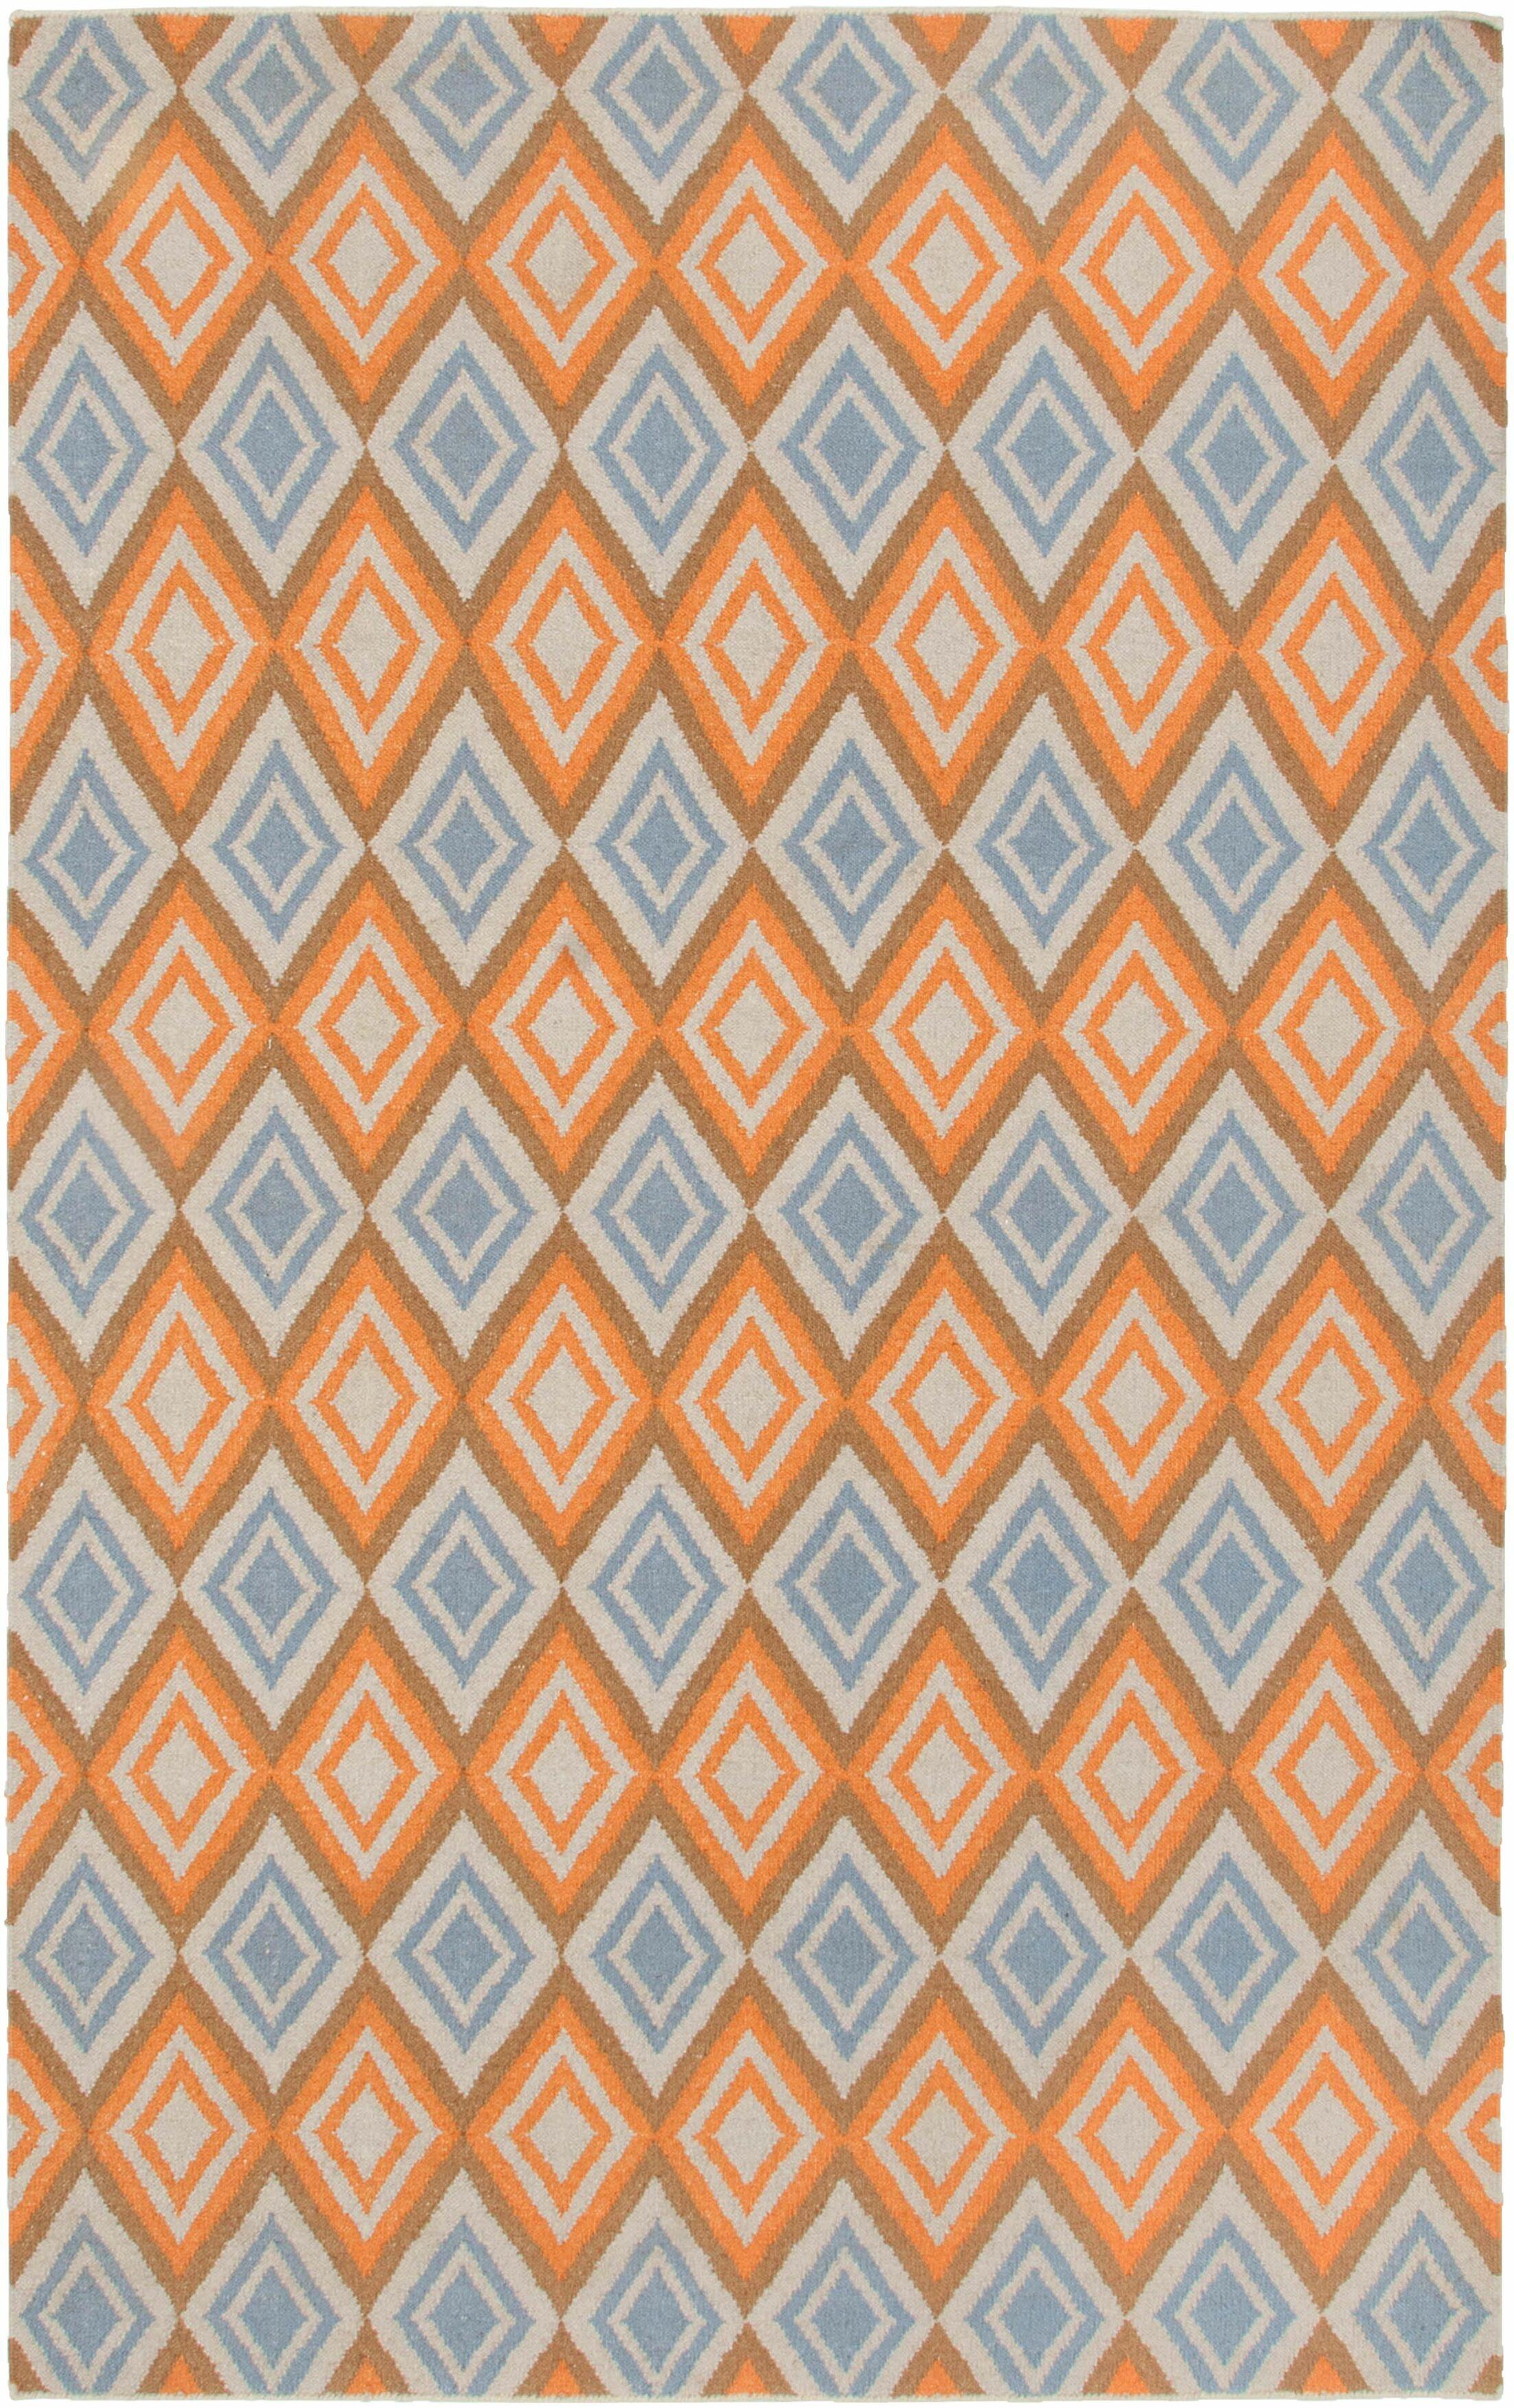 Hand-Woven Rust Area Rug Rug Size: Rectangle 8' x 10'